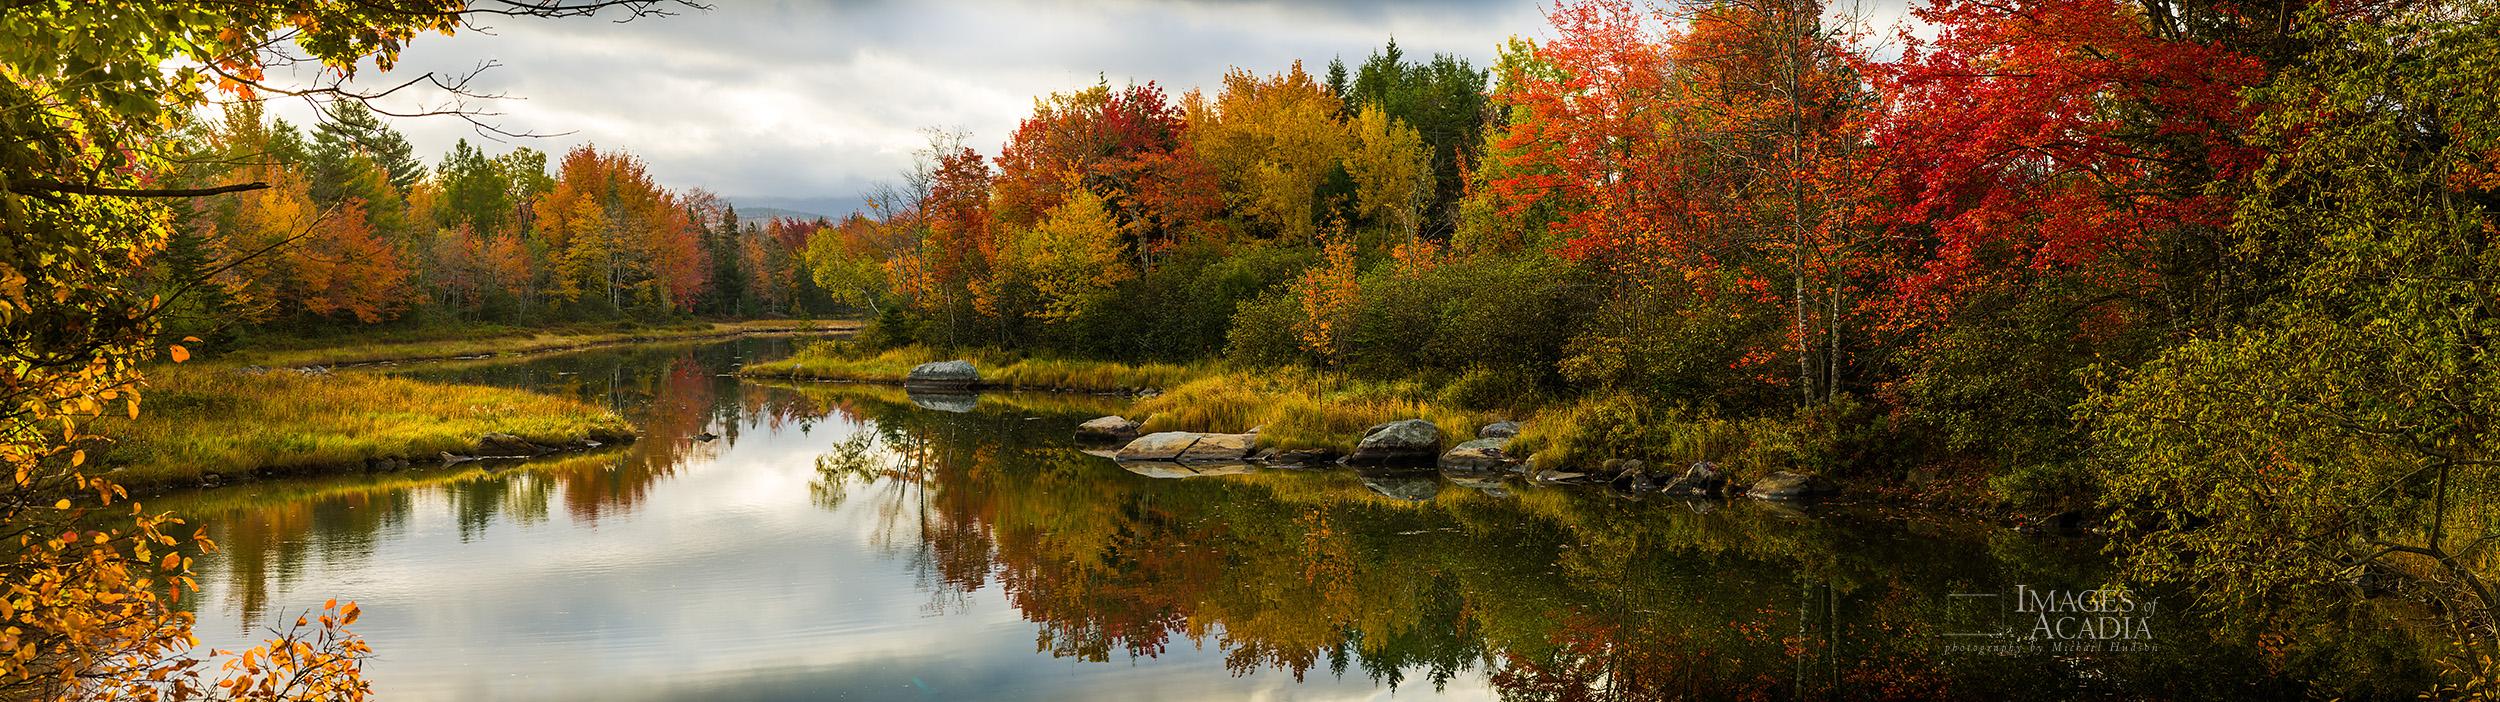 Autumn Foliage, Northeast Creek, Mount Desert Island